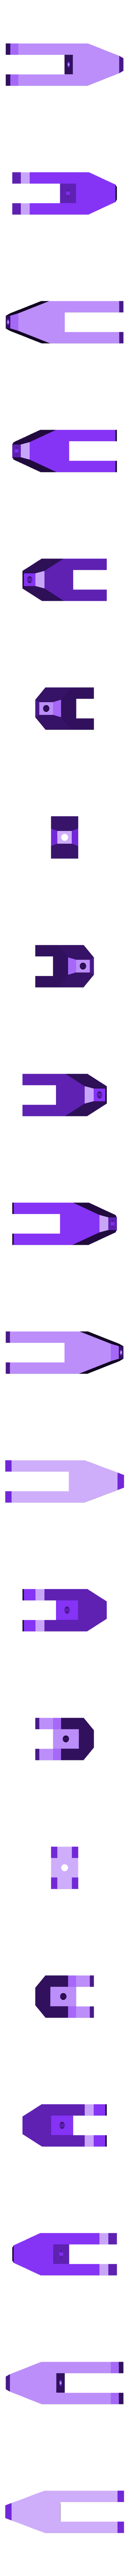 QWICK_SERVO_Long.stl Download free OBJ file Thick Horn and qwick´s LIDL • 3D printer design, PaulDrones